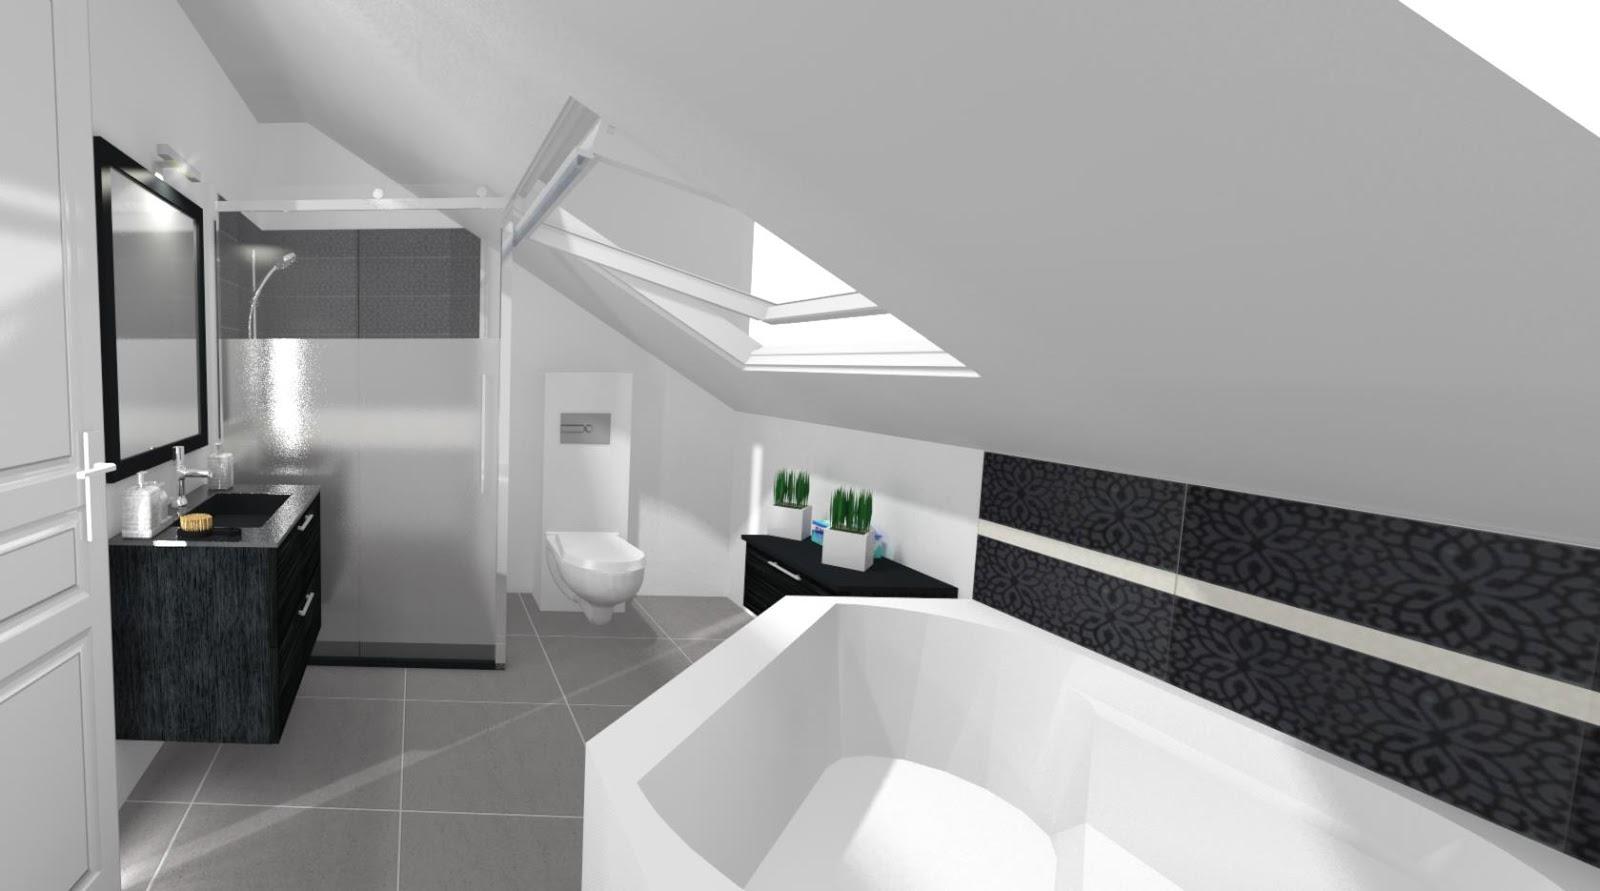 Idee faience salle de bain ukbix for Faience sdb